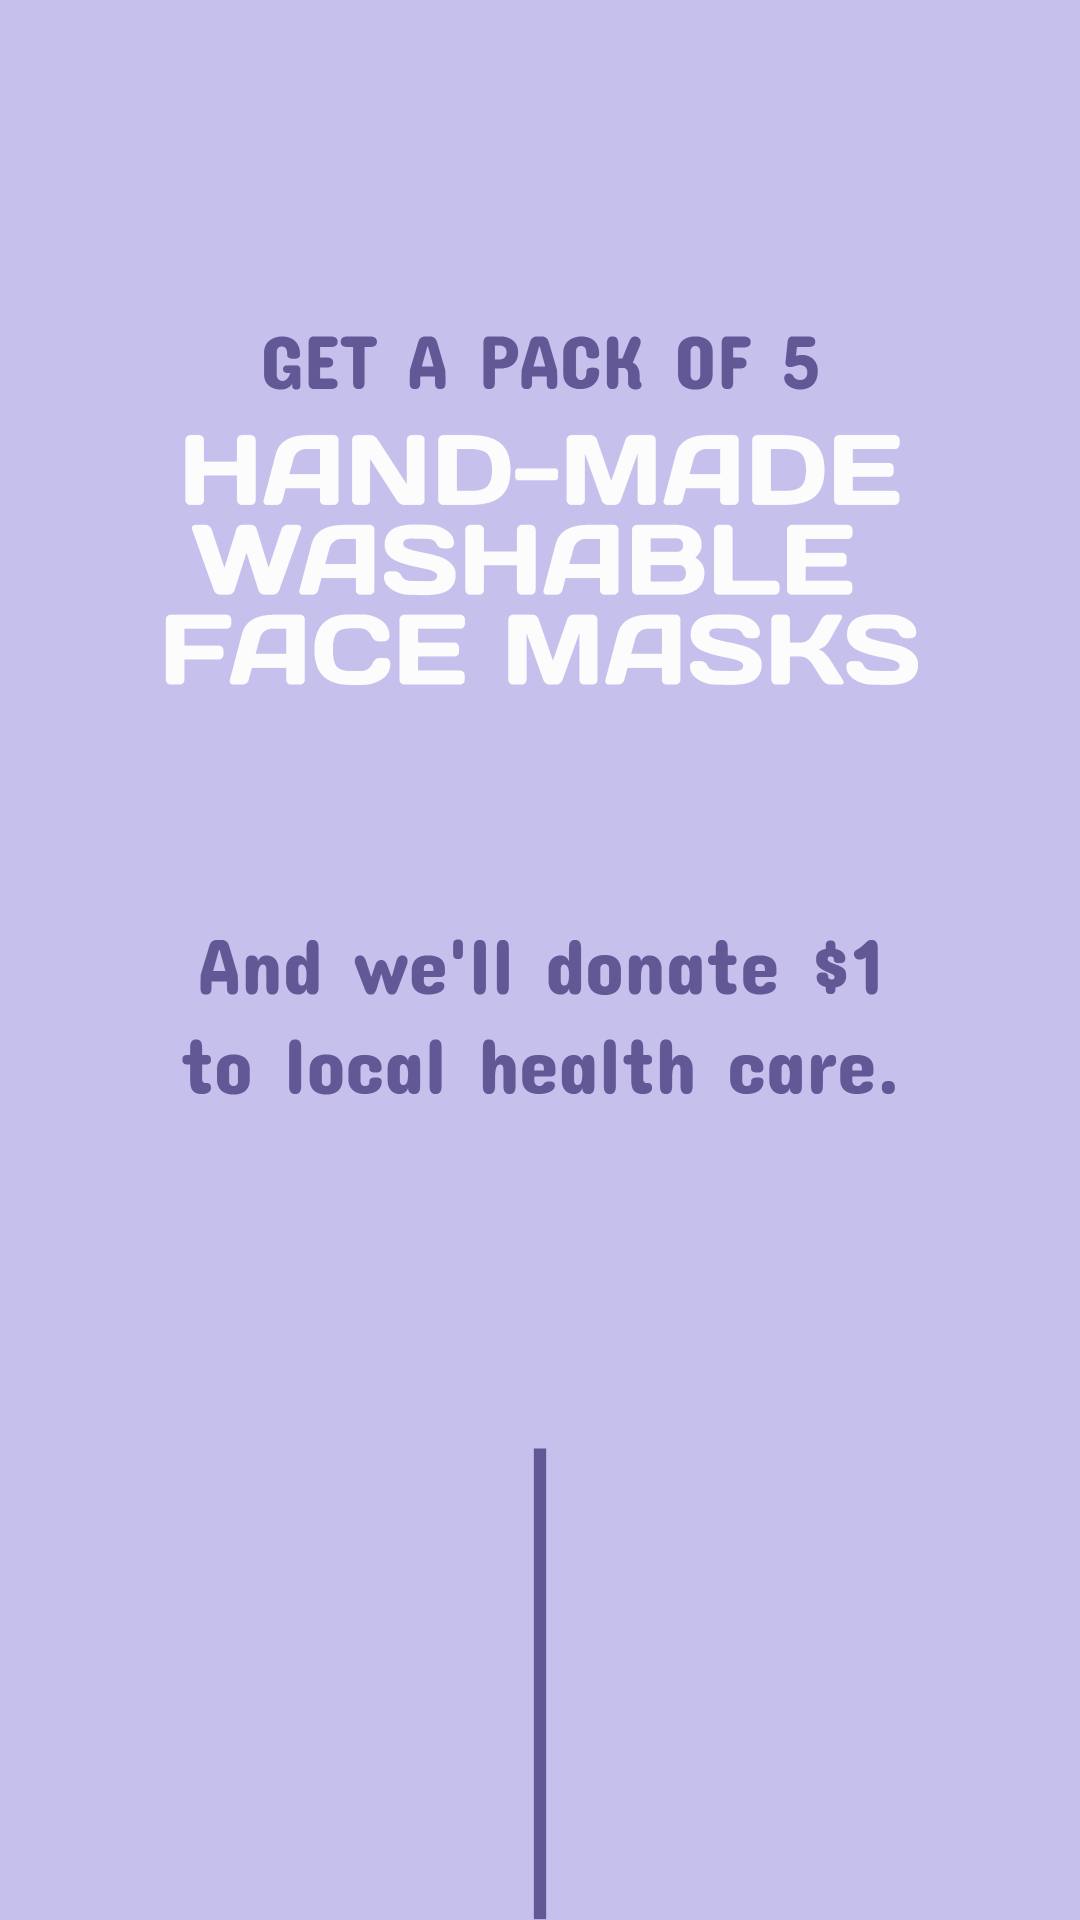 Hand-made washable face masks